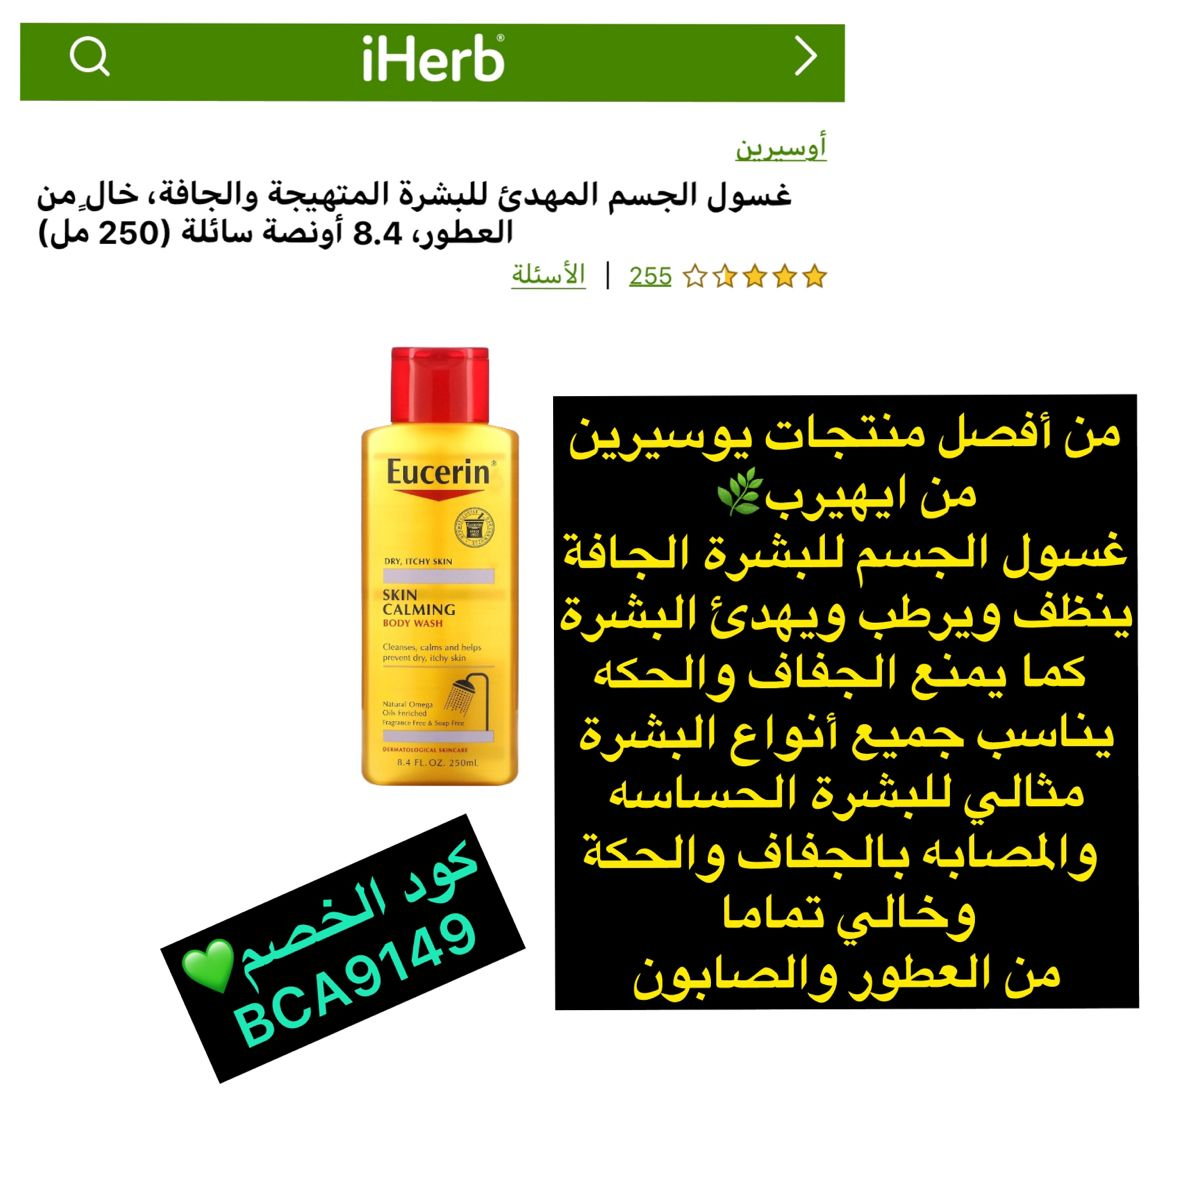 كود خصم ايهيرب Bca9149 Dry Itchy Skin Skin Calming Fragrance Free Products